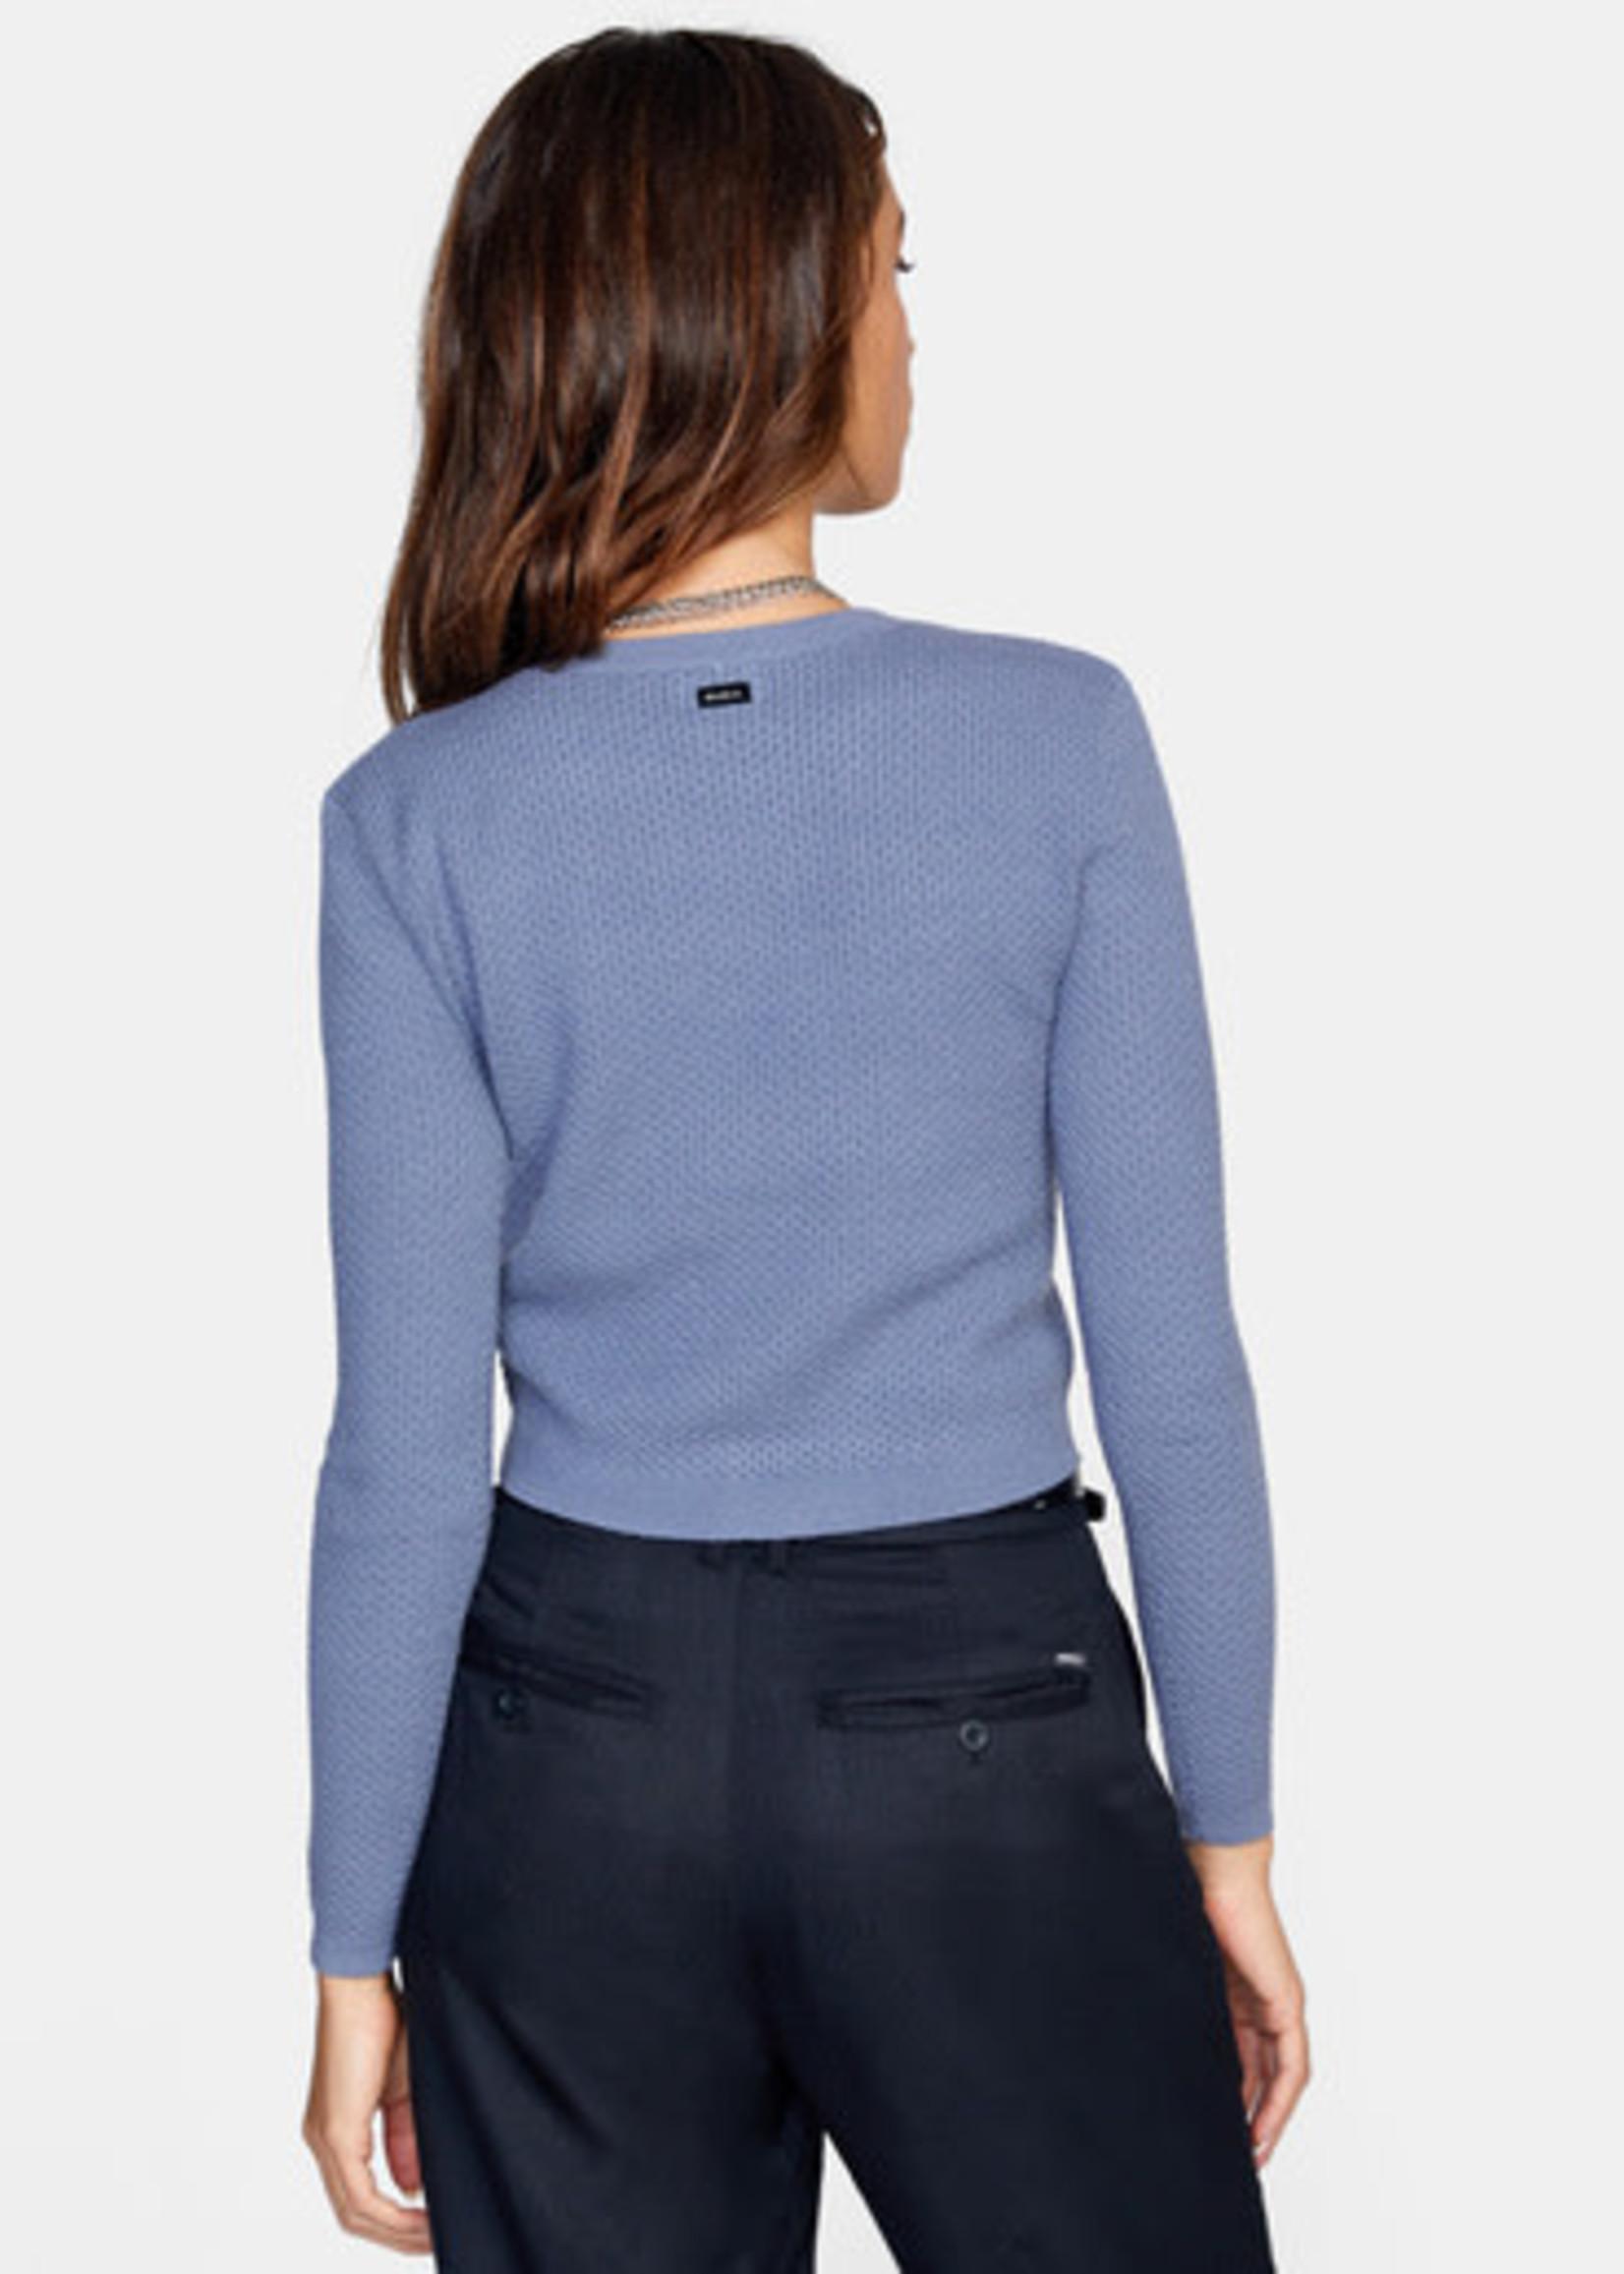 RVCA RVCA, MAYBE LATER Sweater